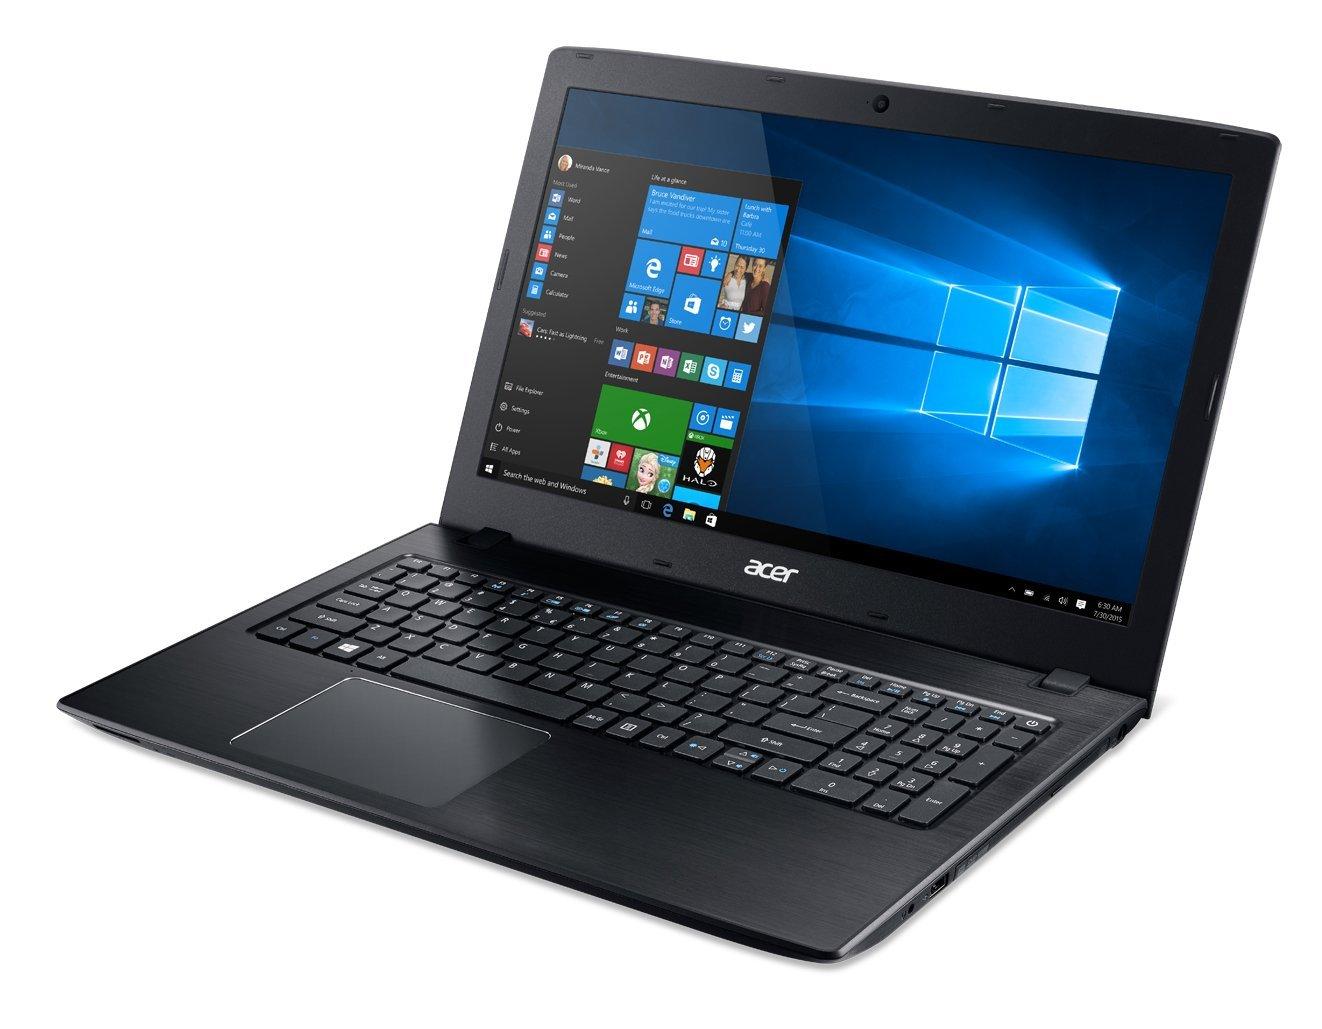 Produk Acer Yang Sangat Bersahabat